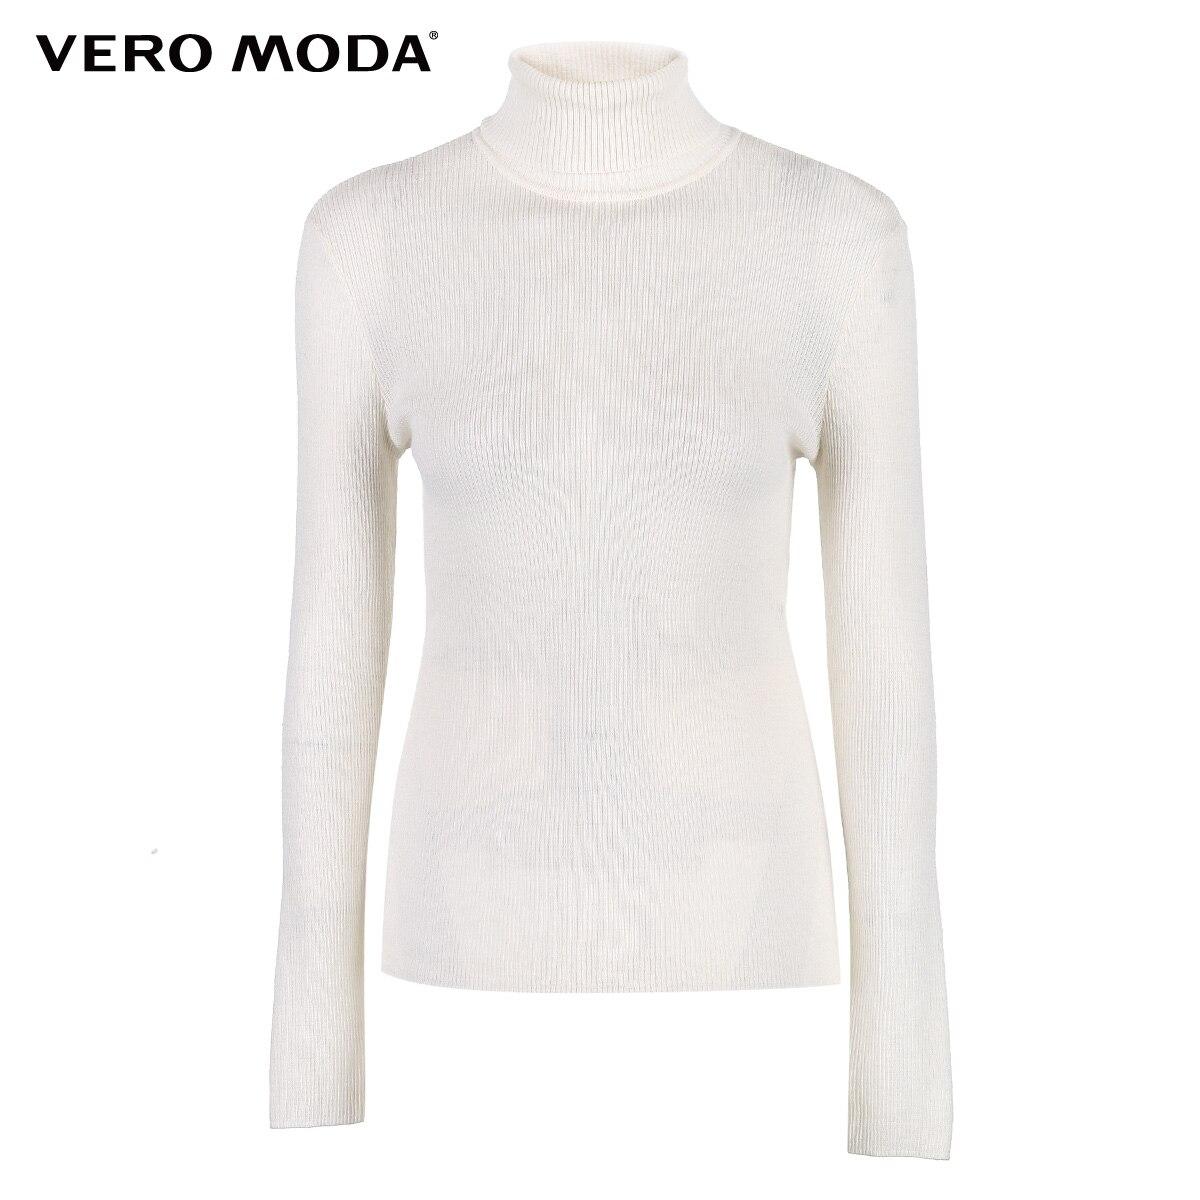 Vero Moda Fall 100 Wool Slim Fit Minimalist Knitted Base turtleneck Knitted Sweater women 318324522